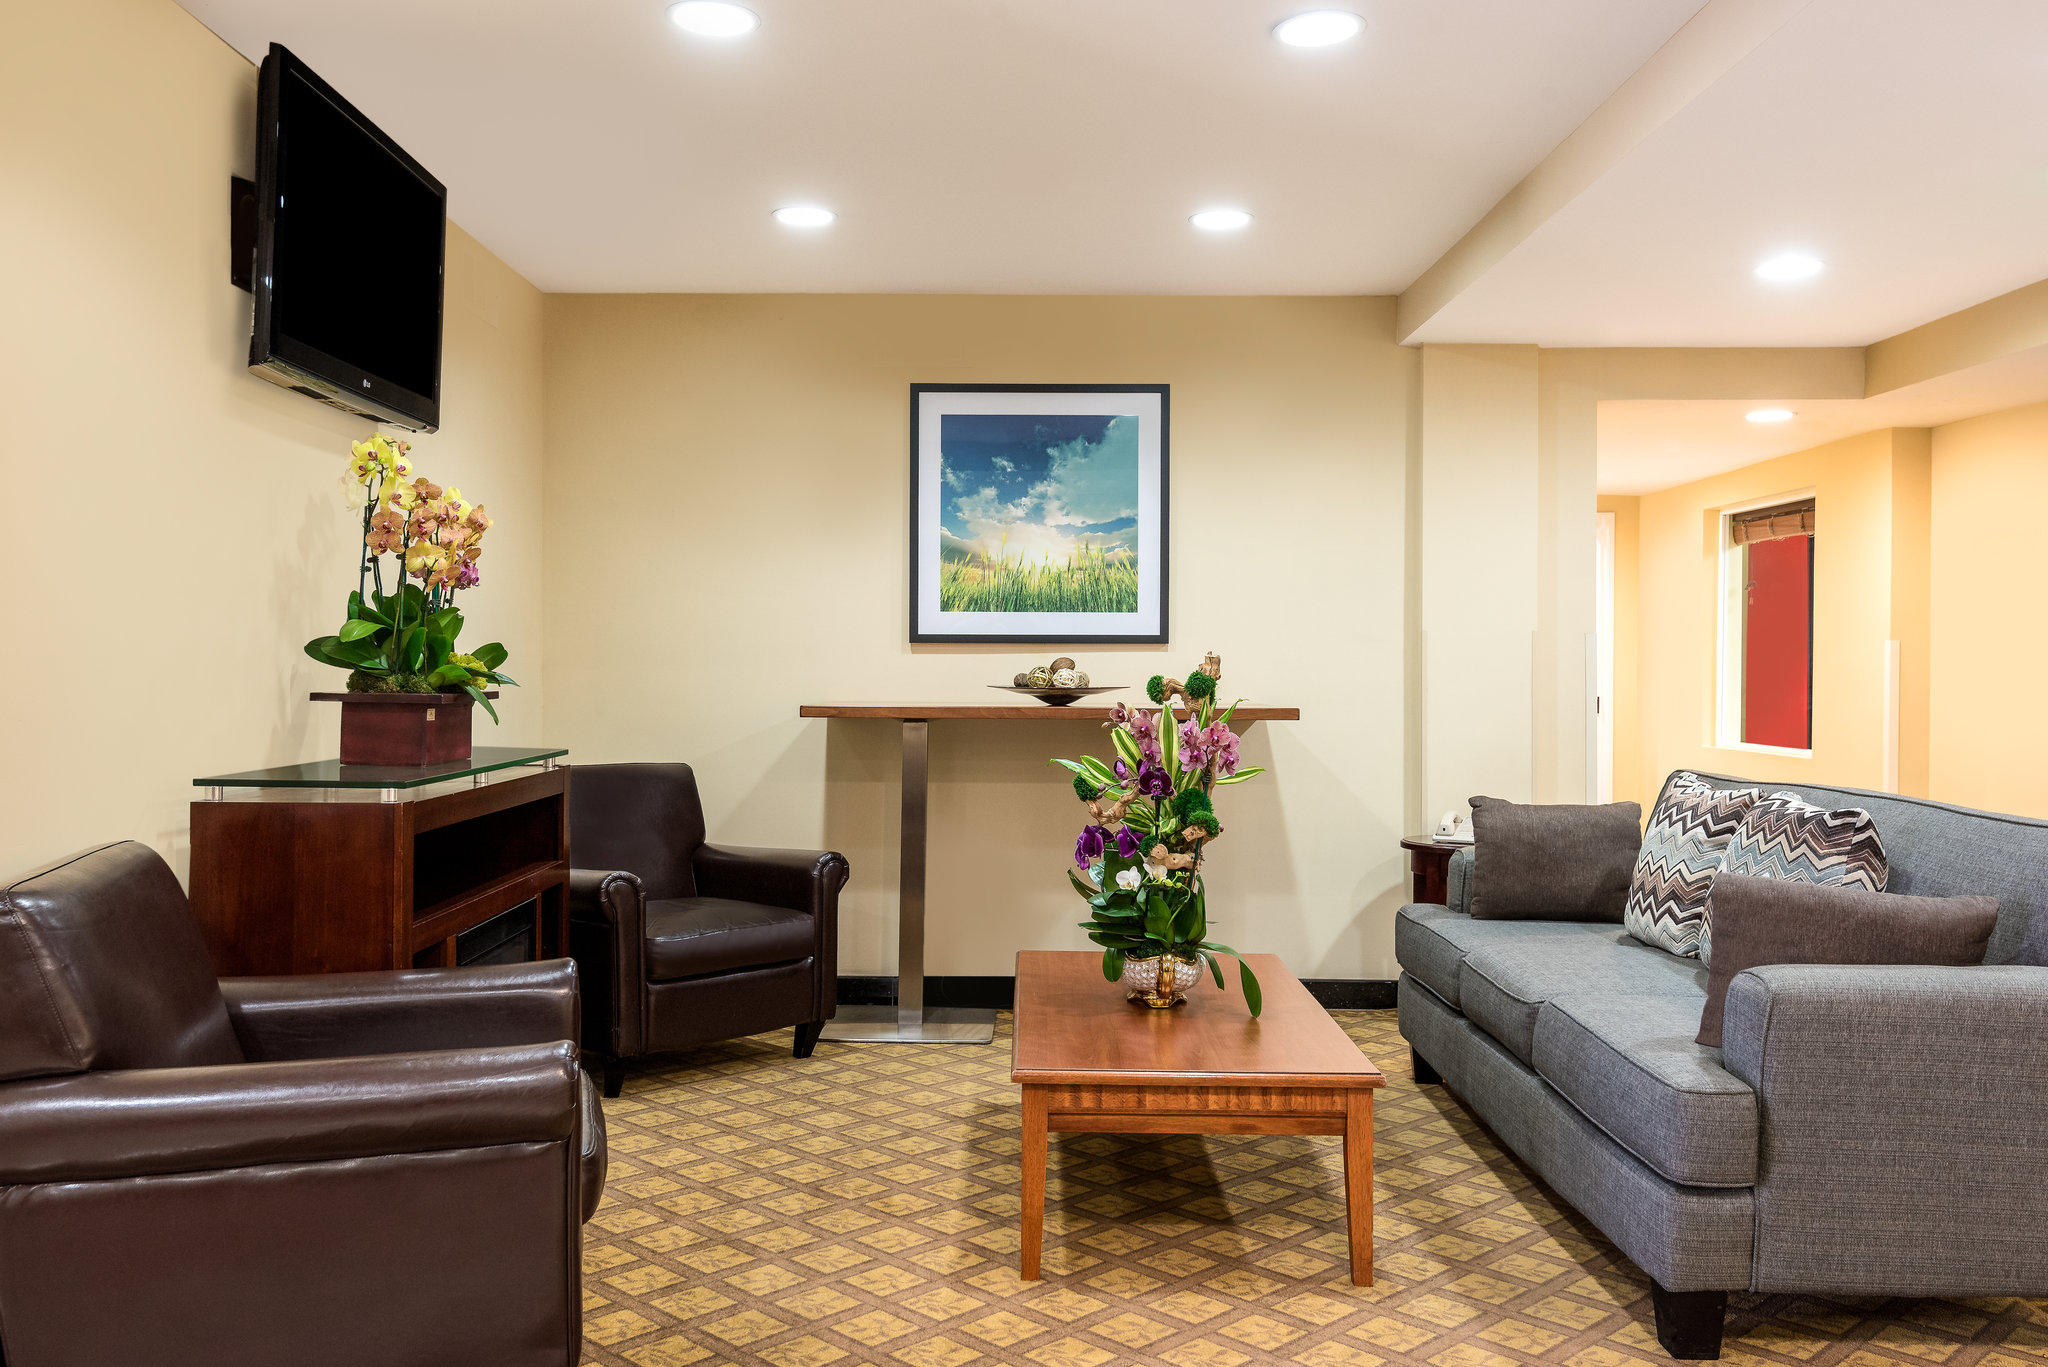 Candlewood Suites LAX Hawthorne, an IHG Hotel